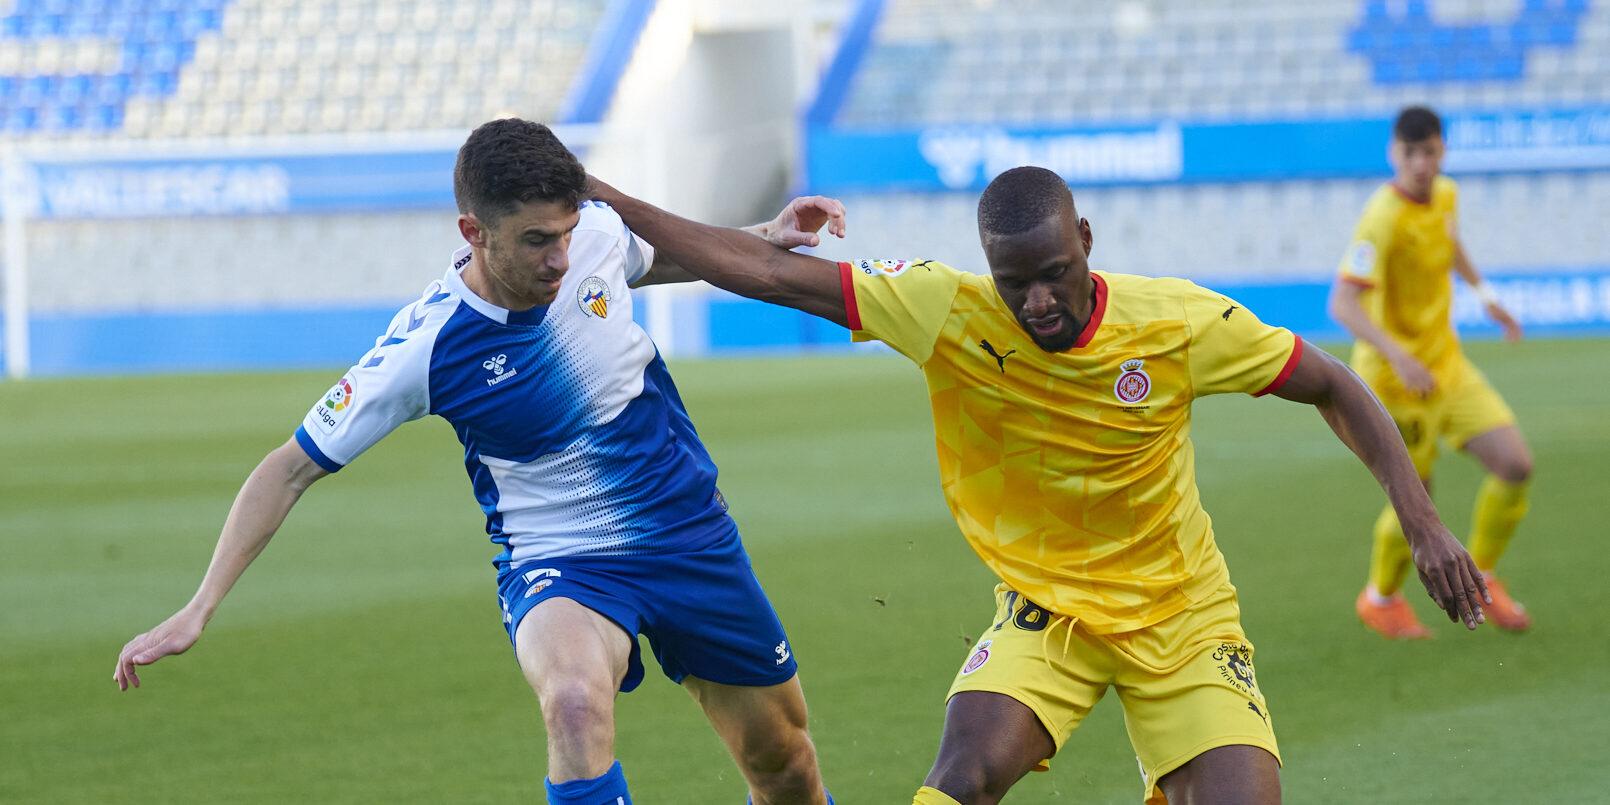 Imatge del derbi català entre Sabadell i Girona | Girona FC